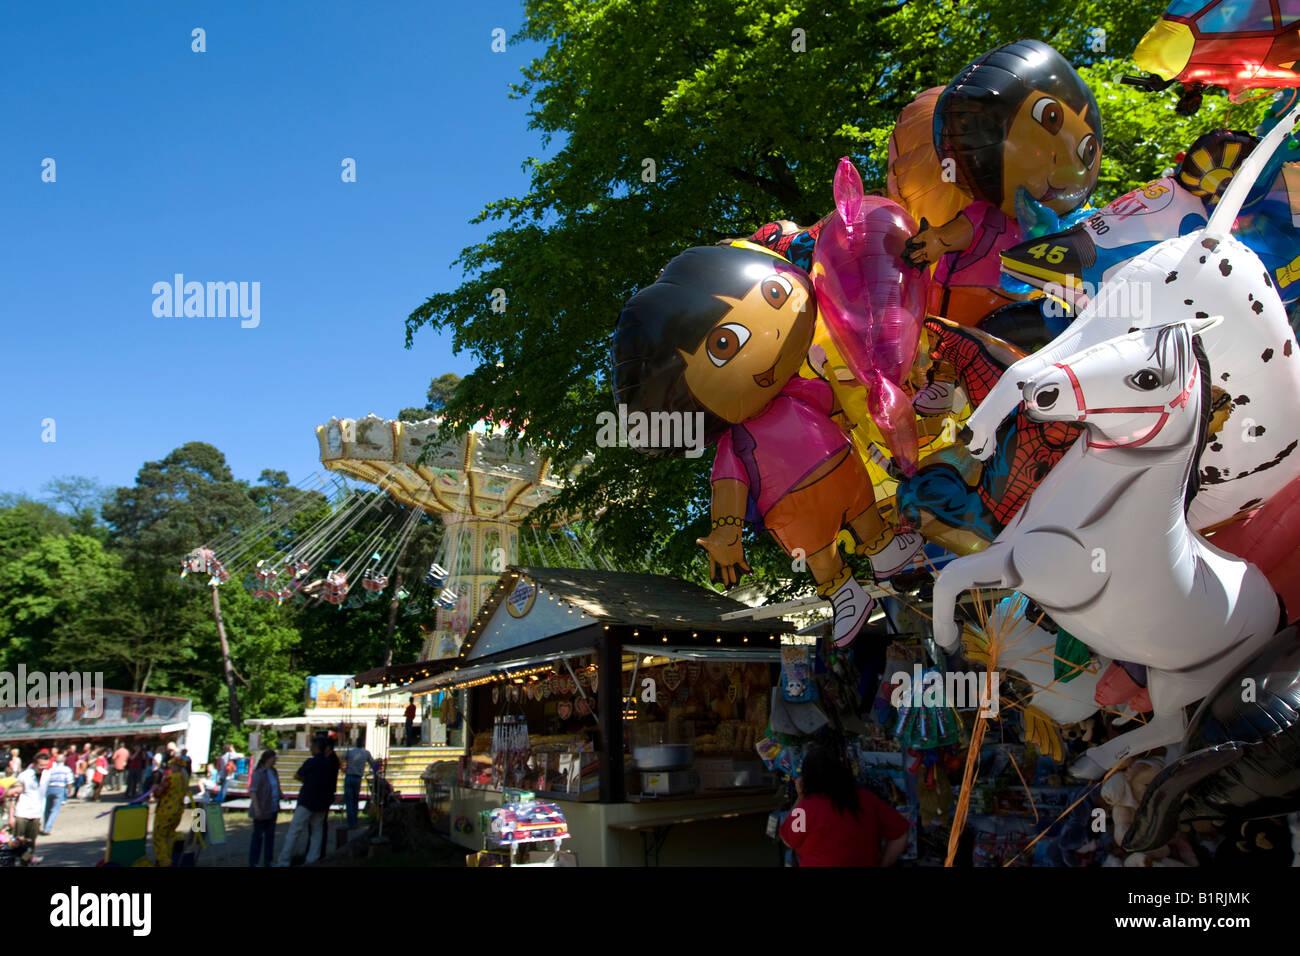 Balloons, chain carousel at back, traditional Waeldchestag, Frankfurt, Hesse, Germany, Europe Stock Photo